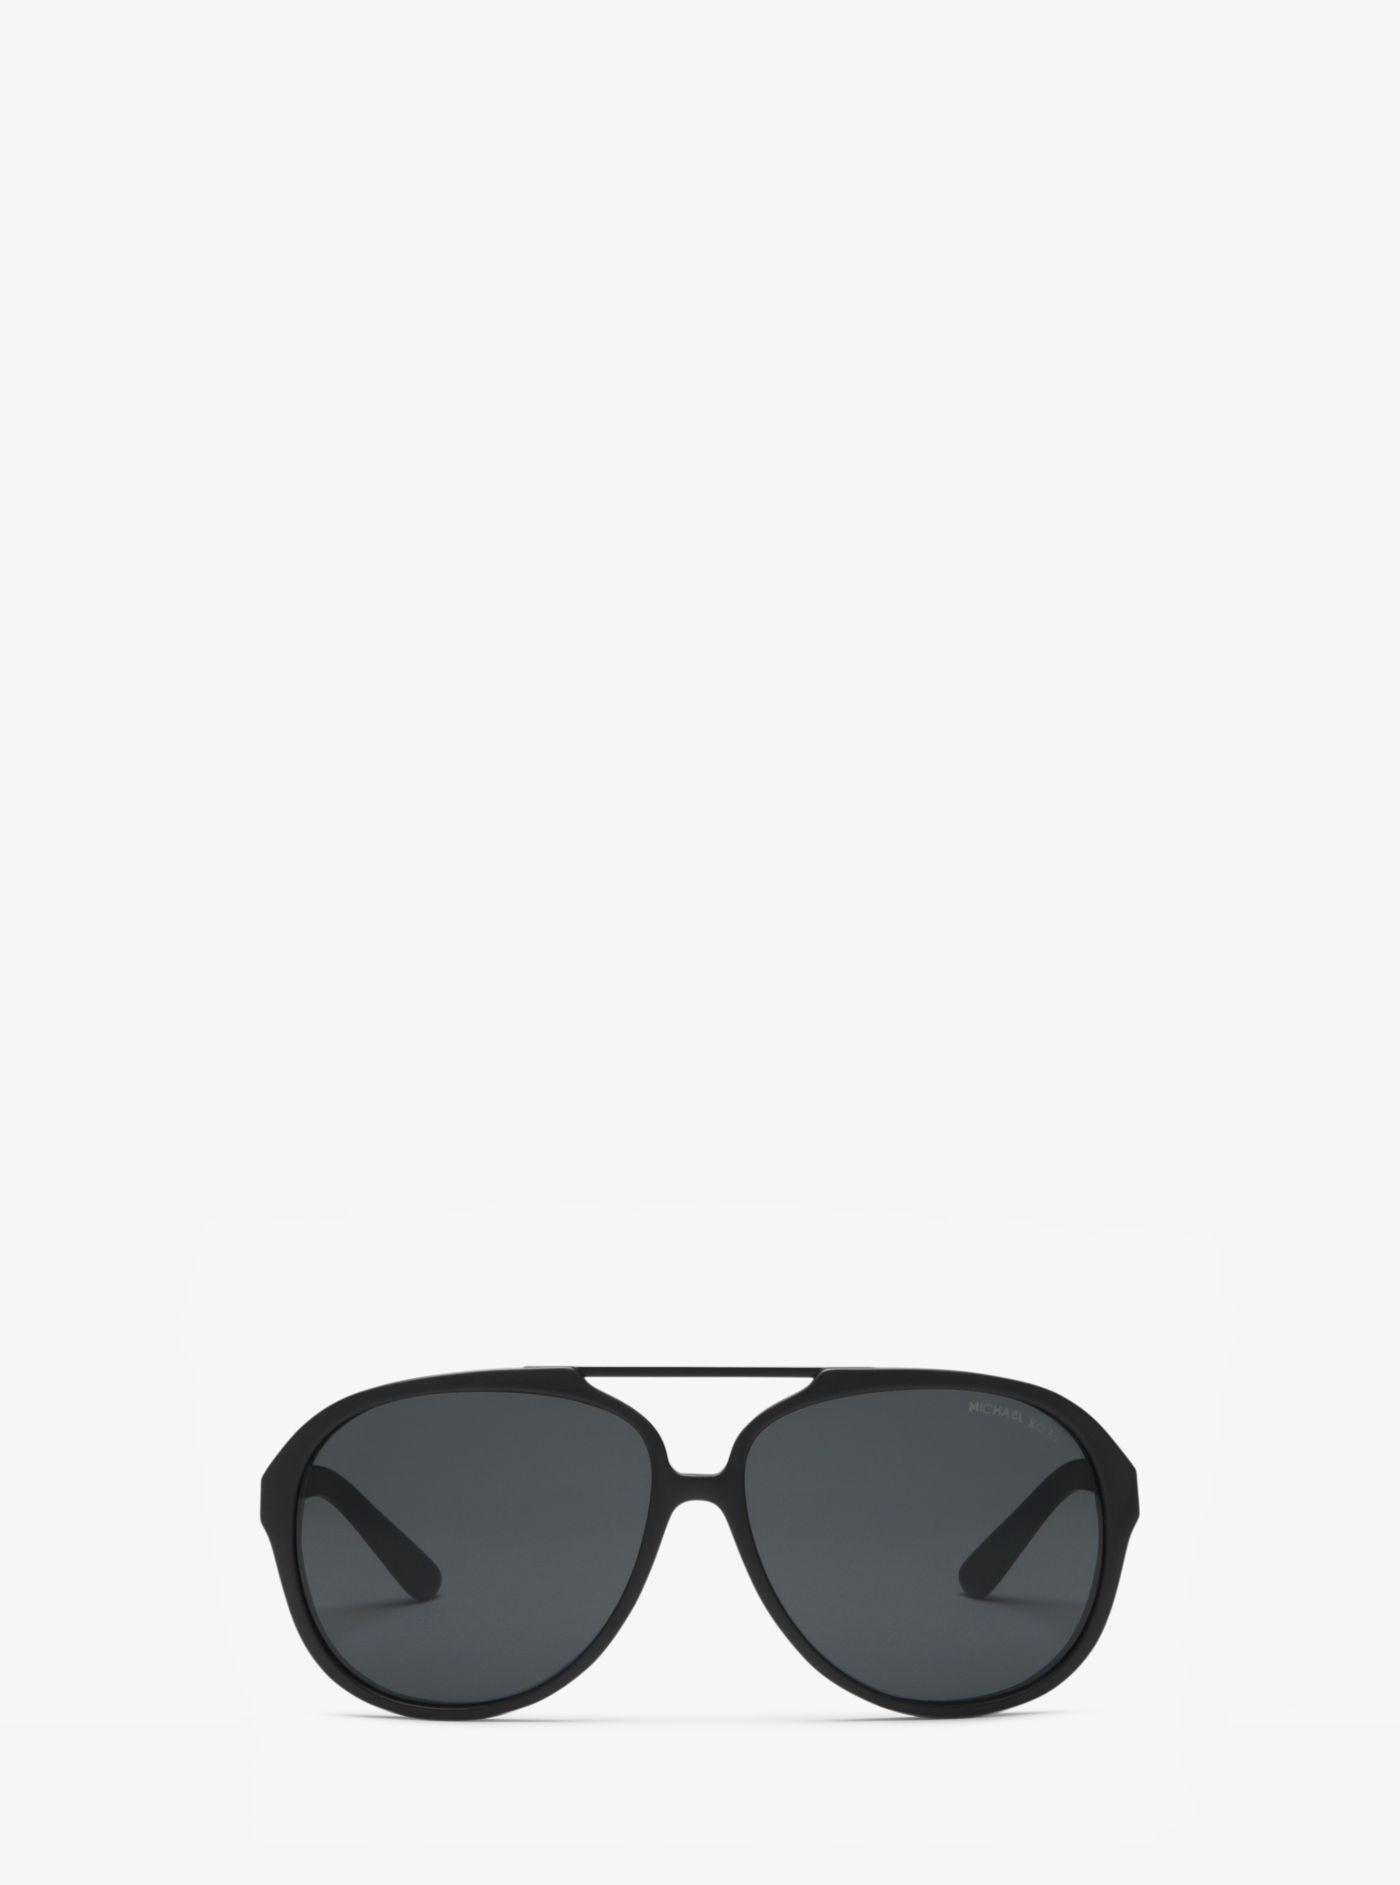 c36745a395 Lyst - Michael Kors Auden Sunglasses in Black for Men